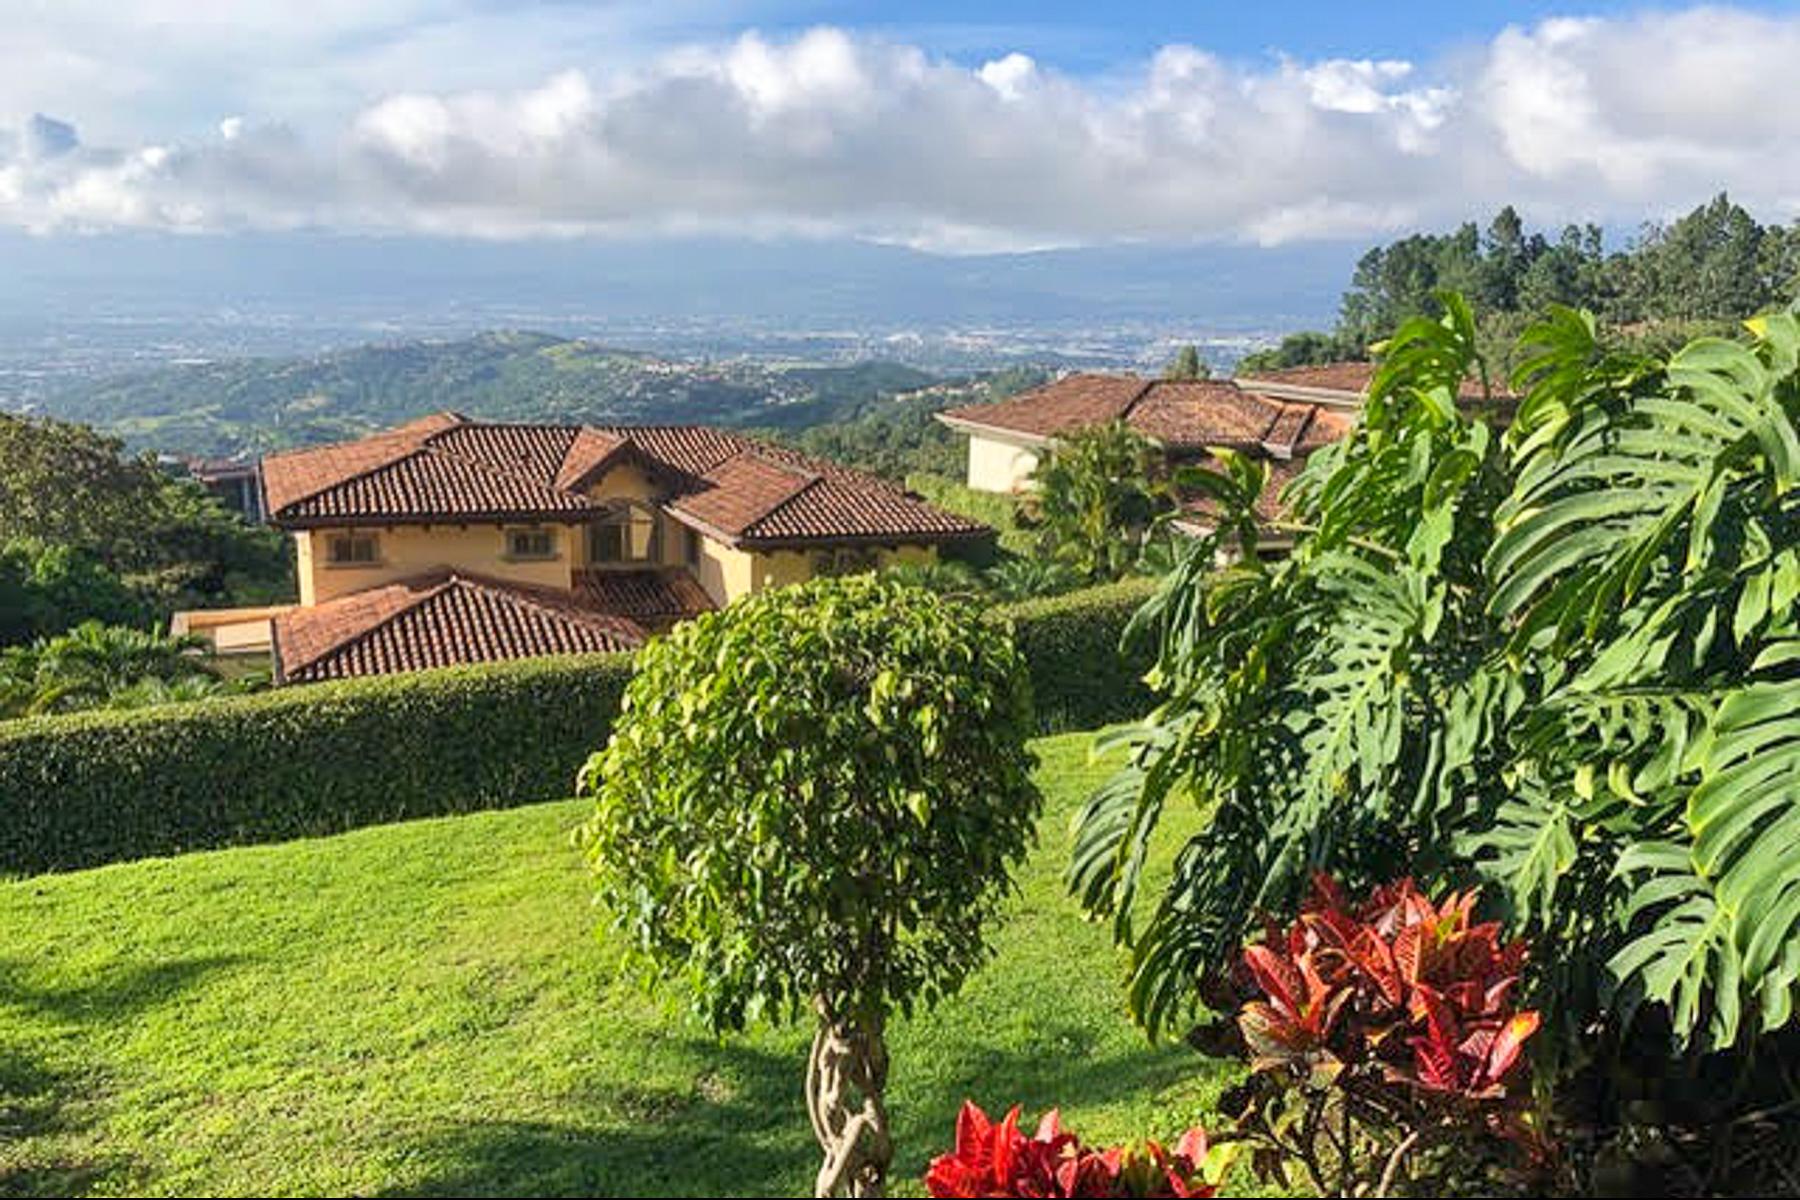 Apartments for Sale at Welcome Le Monastere, Escazú Escazu, San Jose Costa Rica